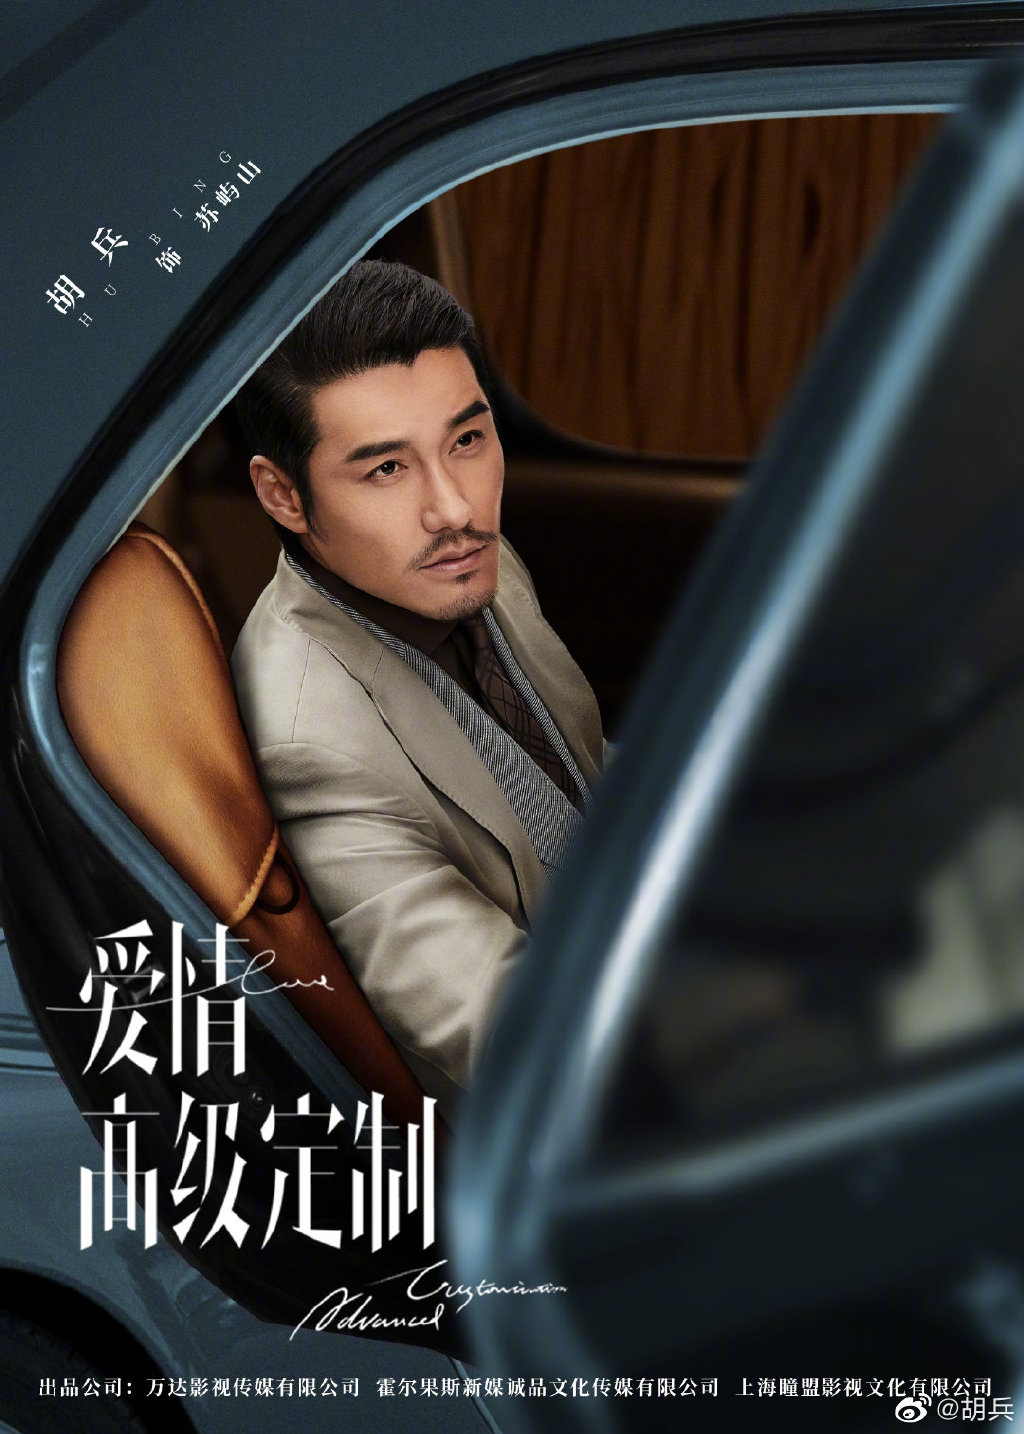 Hu Bing